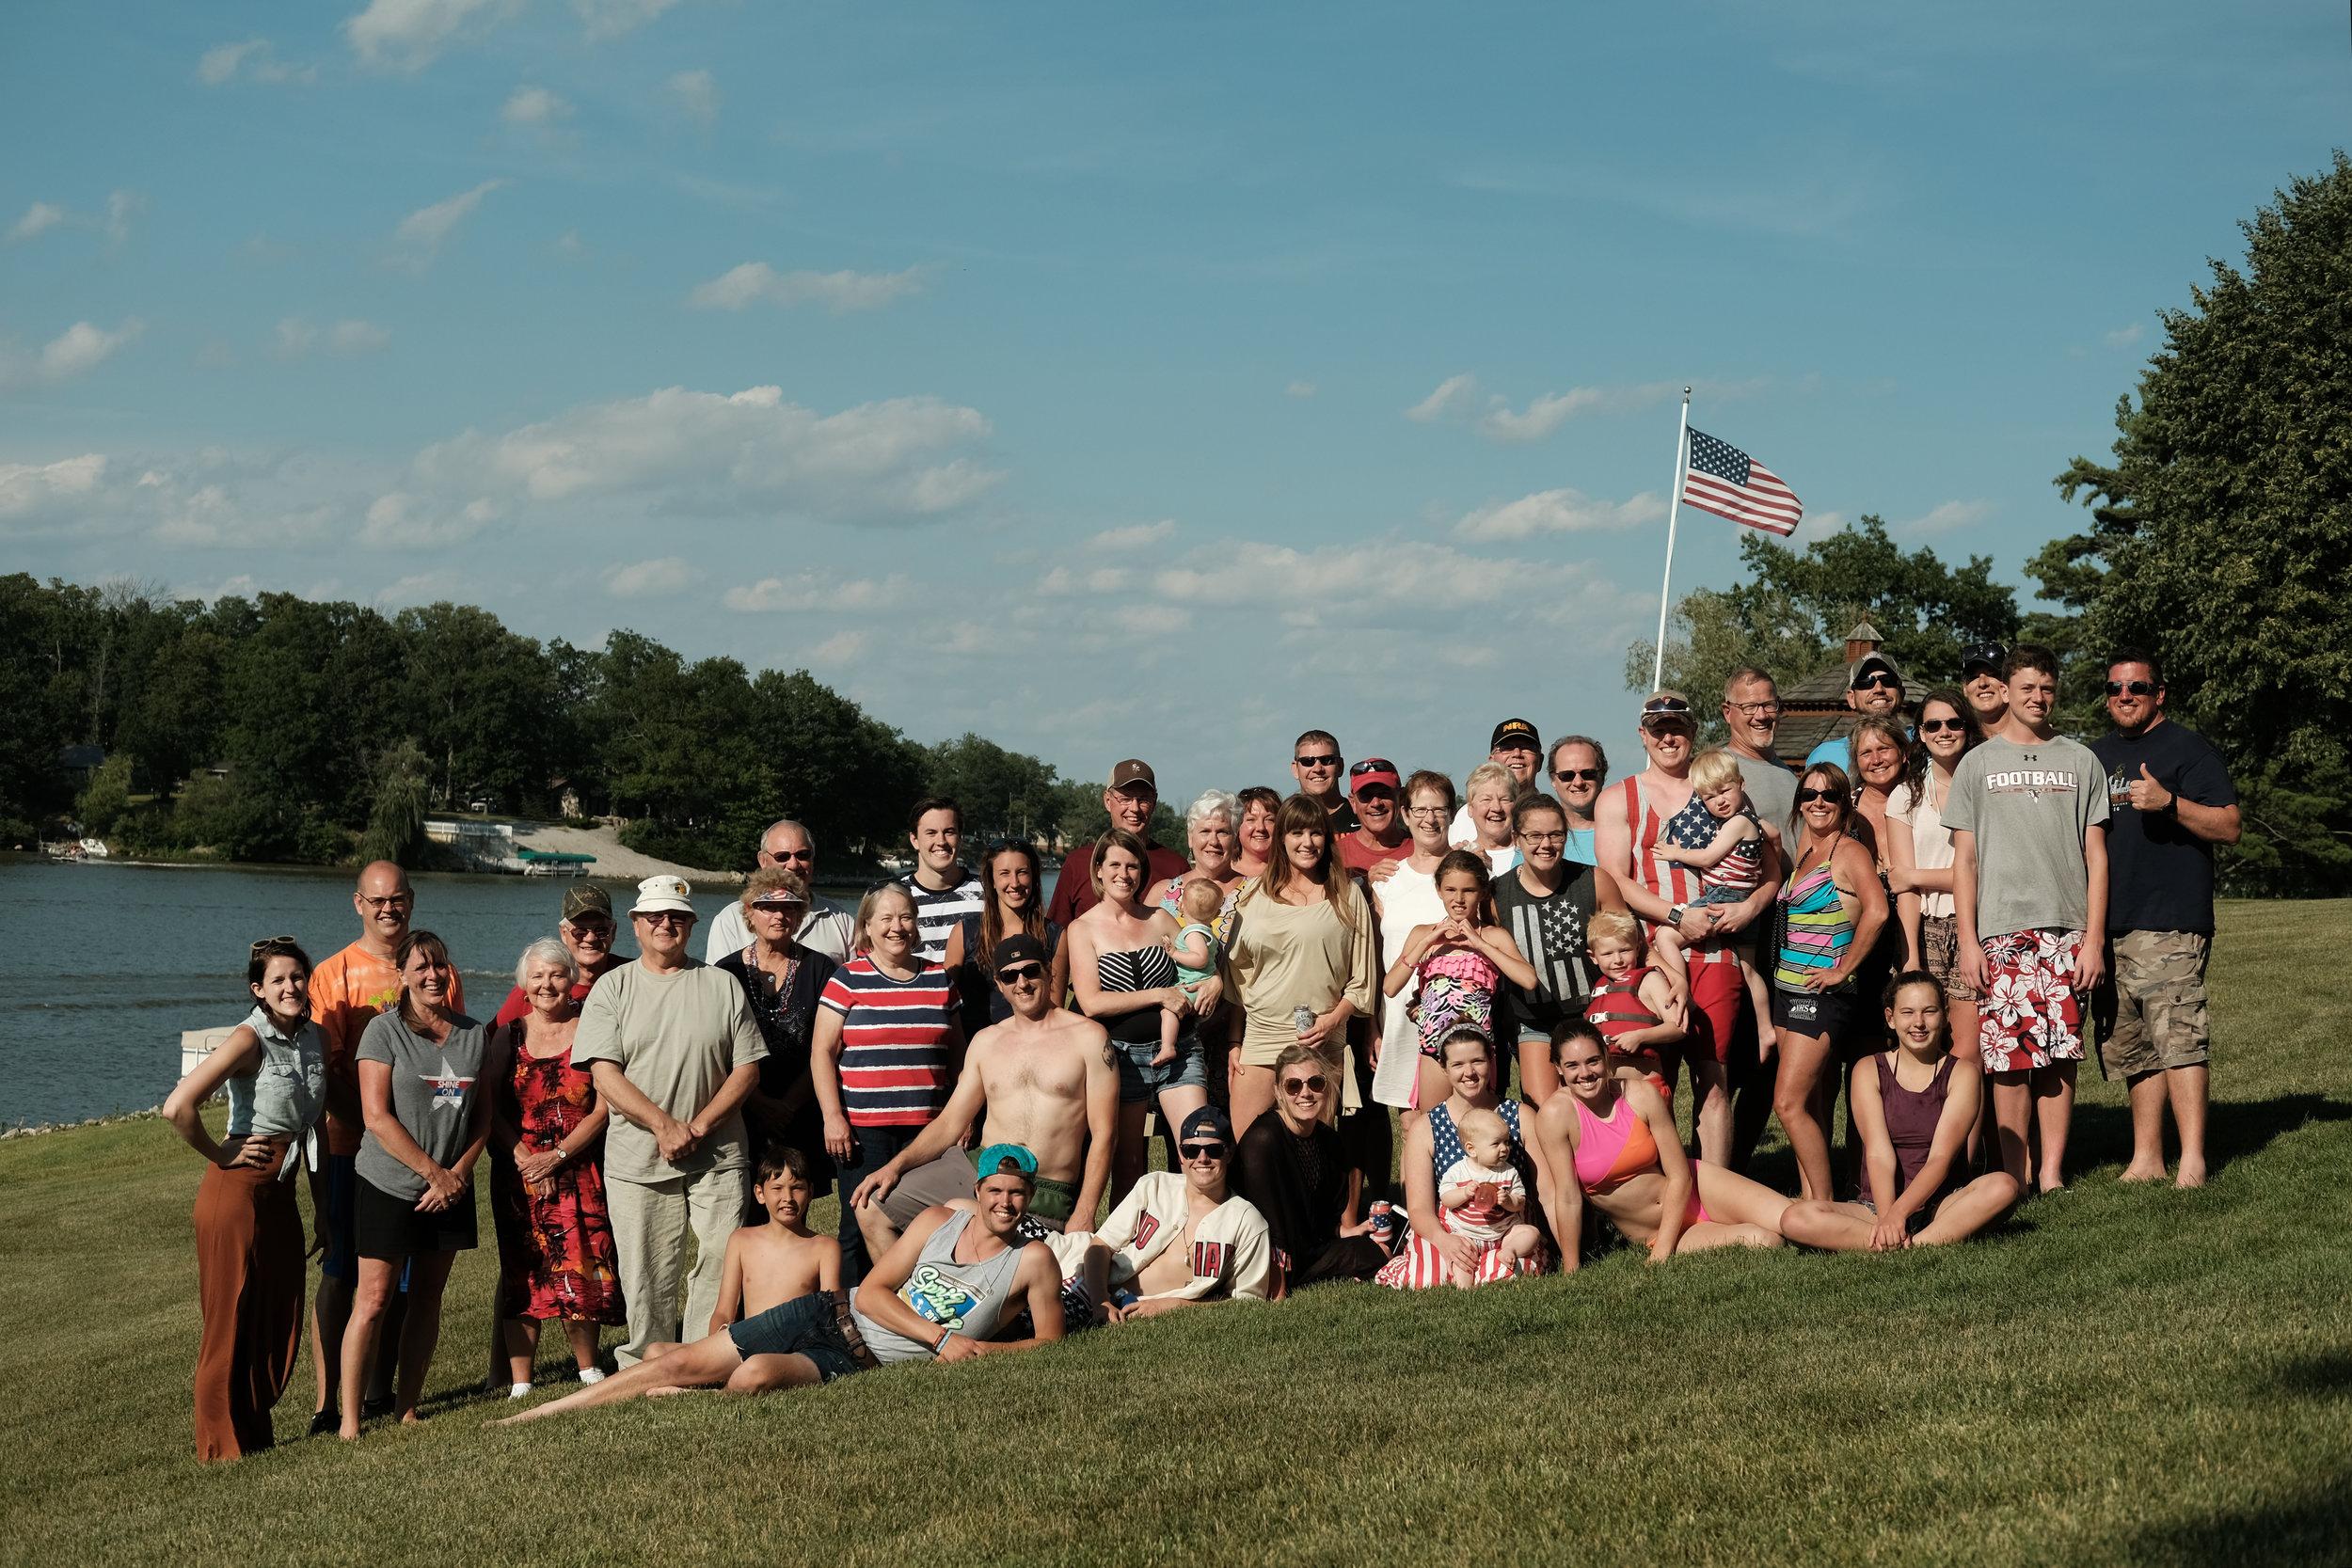 Family_Fun_at_Seneca_Lake